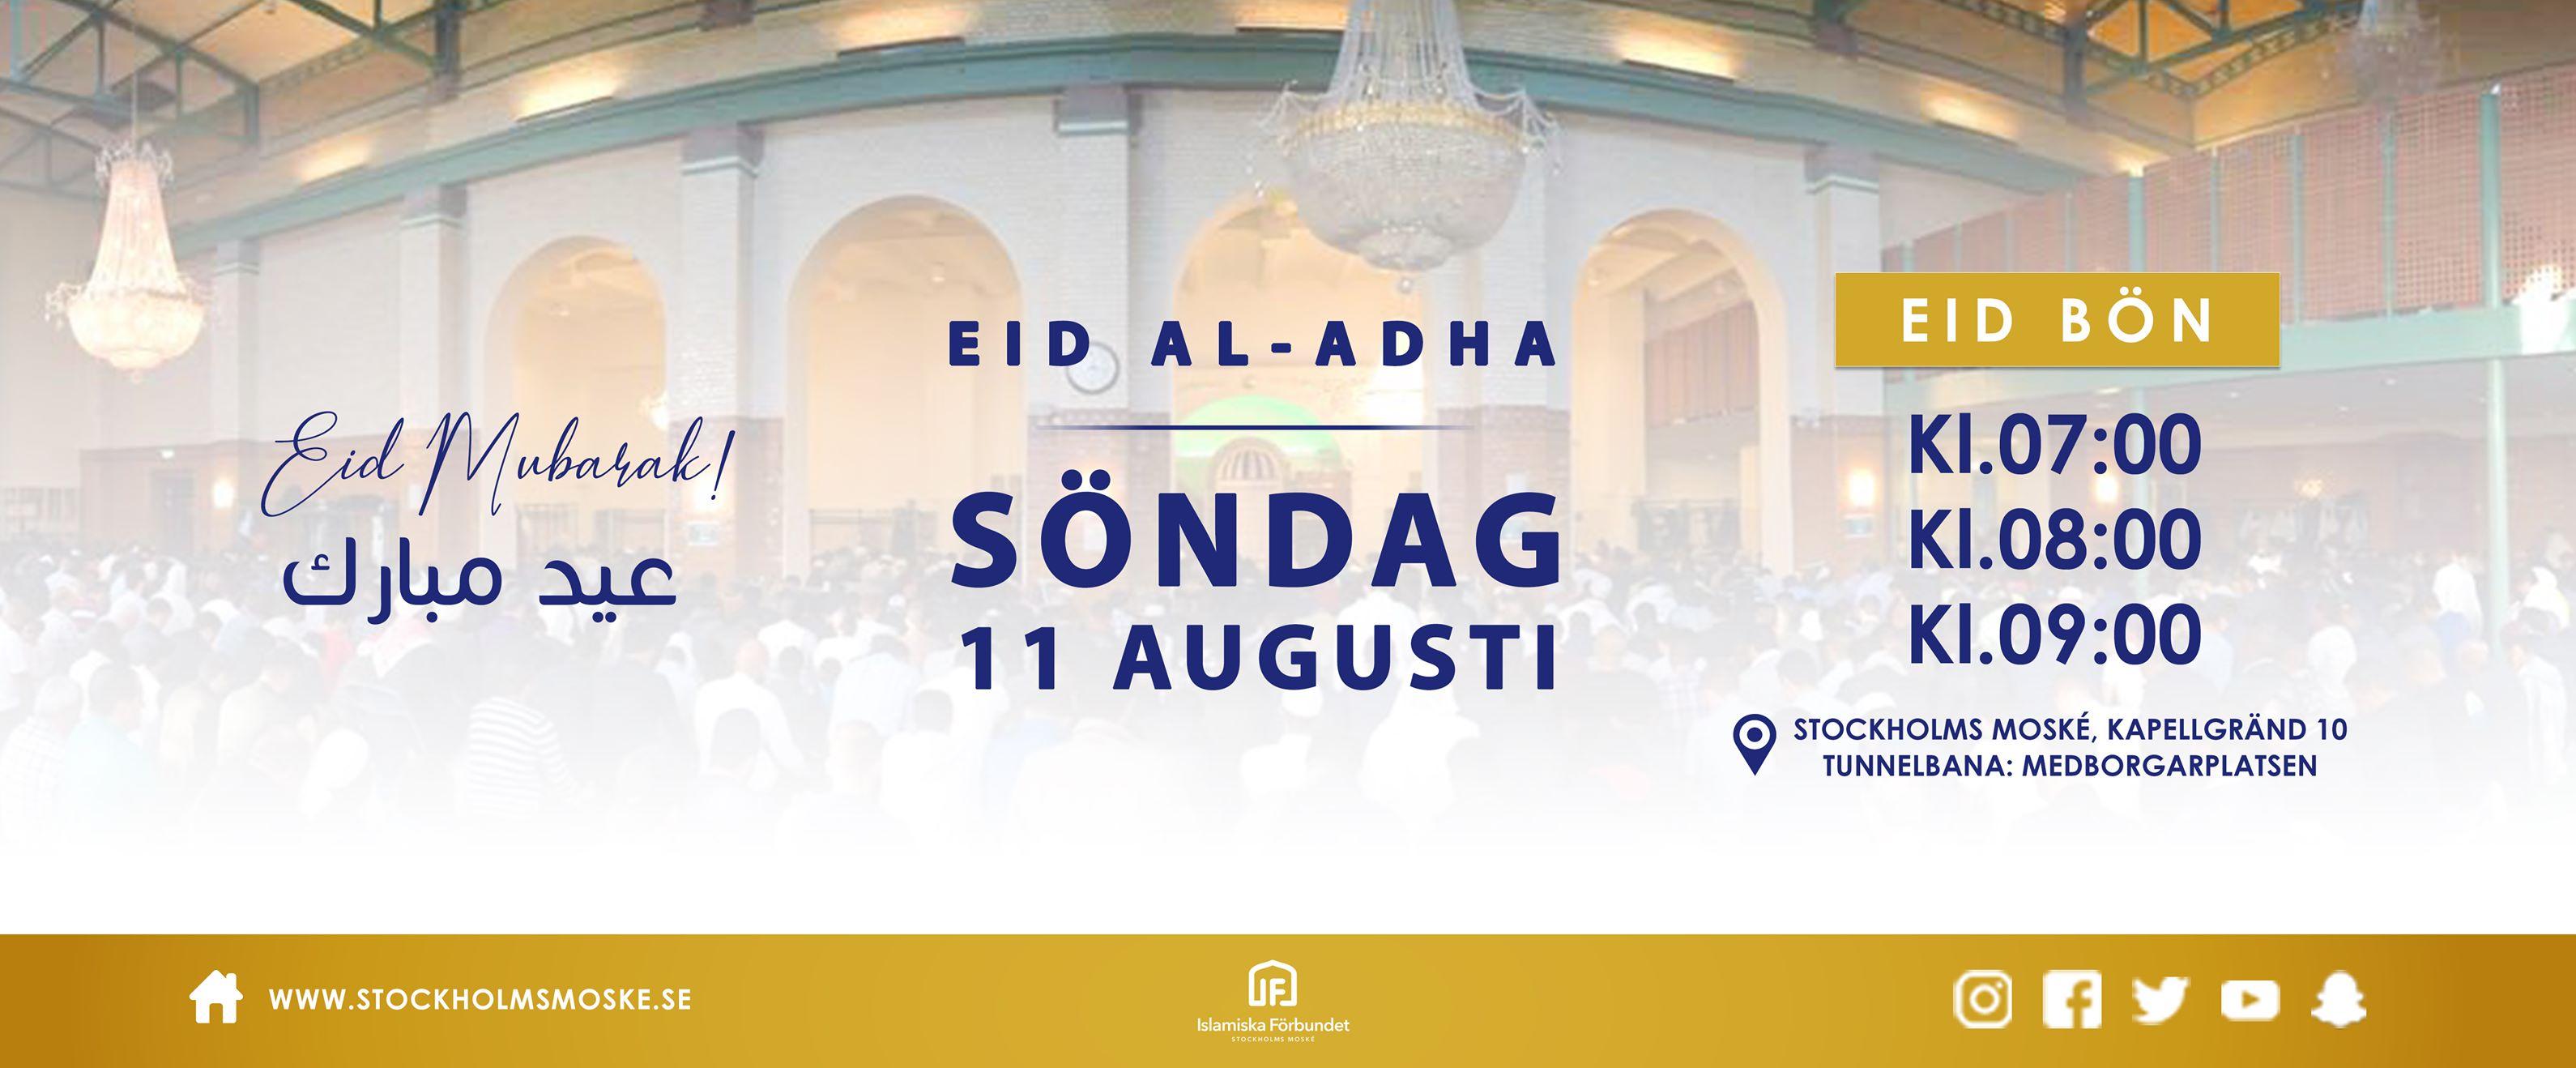 Eid Al-Adha infaller söndag den 11:e augusti, 2019